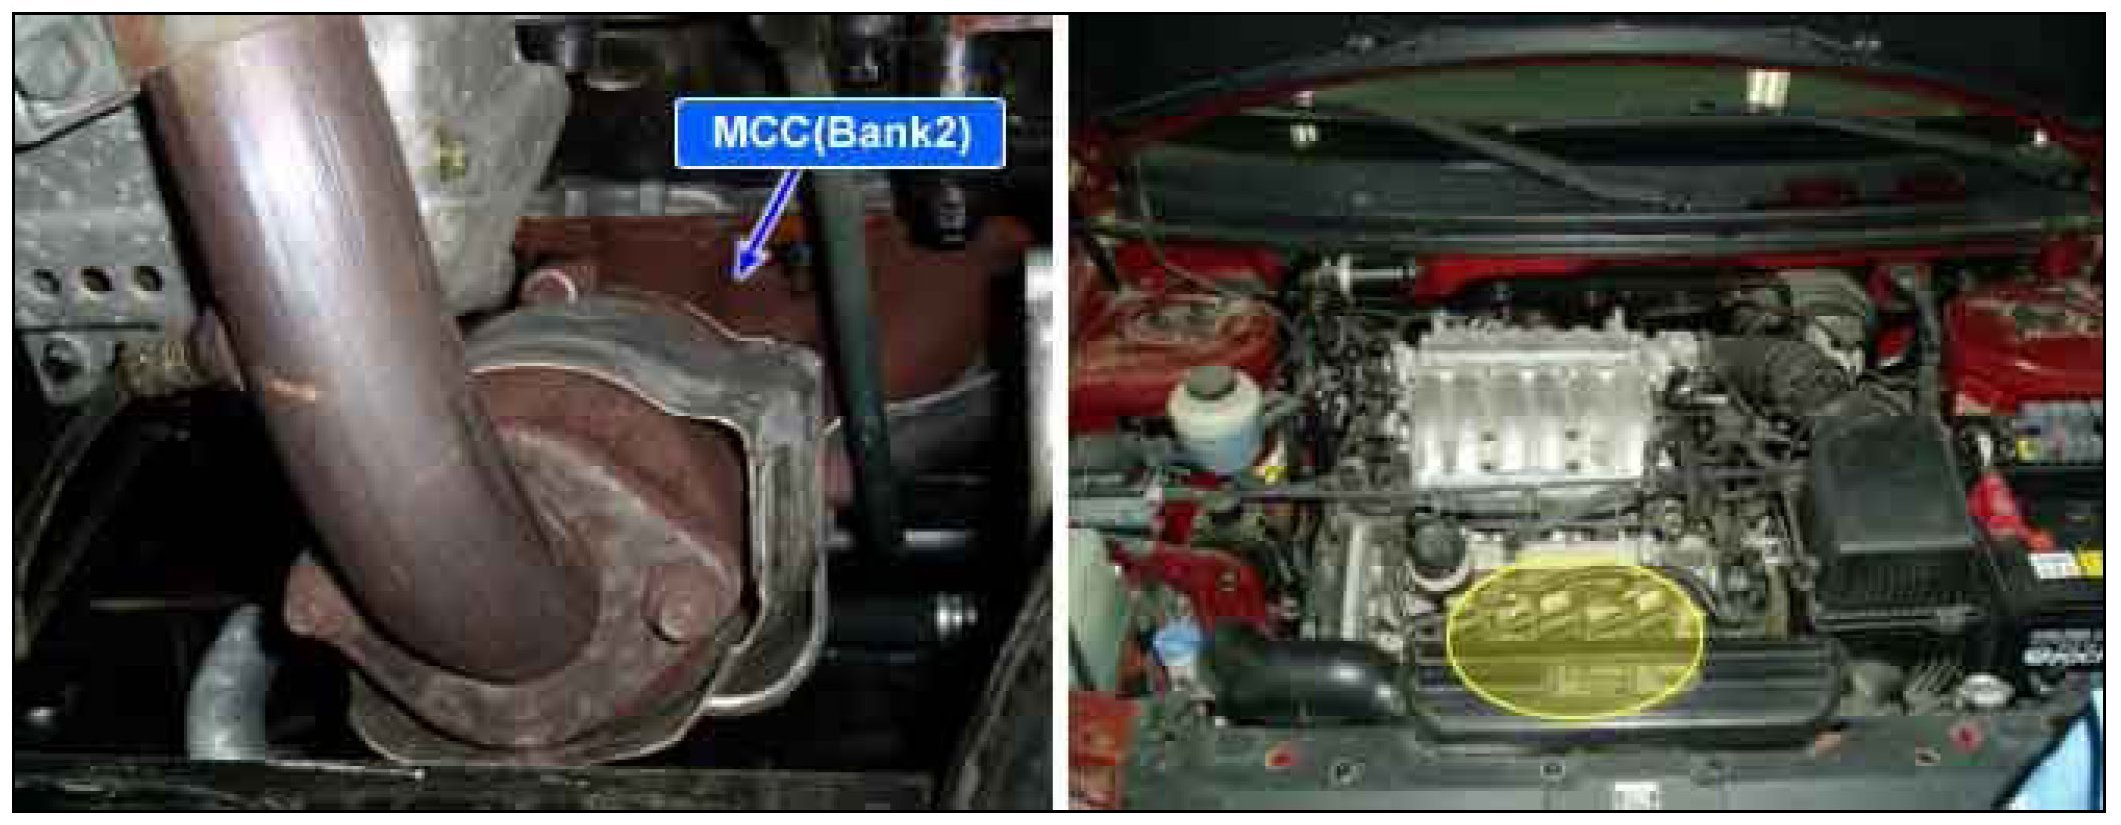 Obdii Code P0325 2003 Kia Sedona Knock Sensor Circuit Malfunction